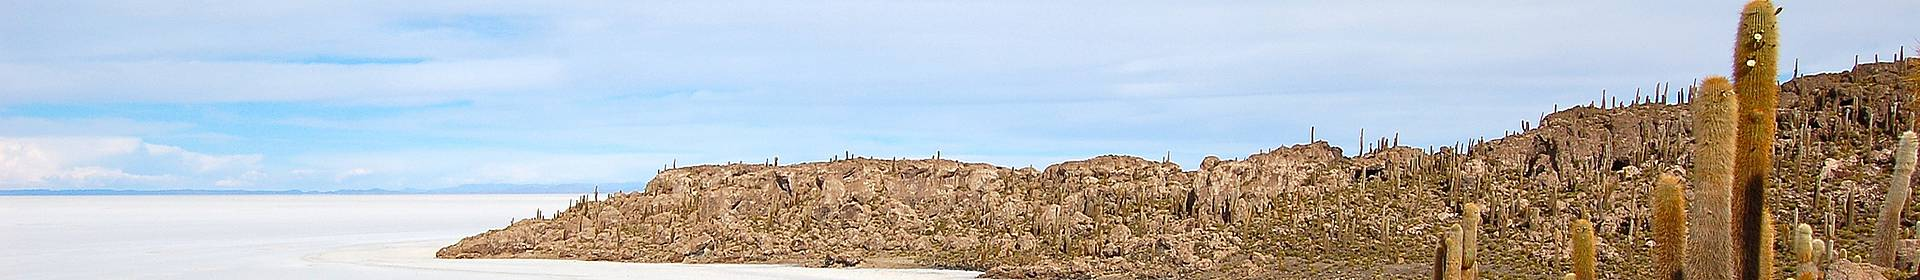 L'Île d'Incahuasi